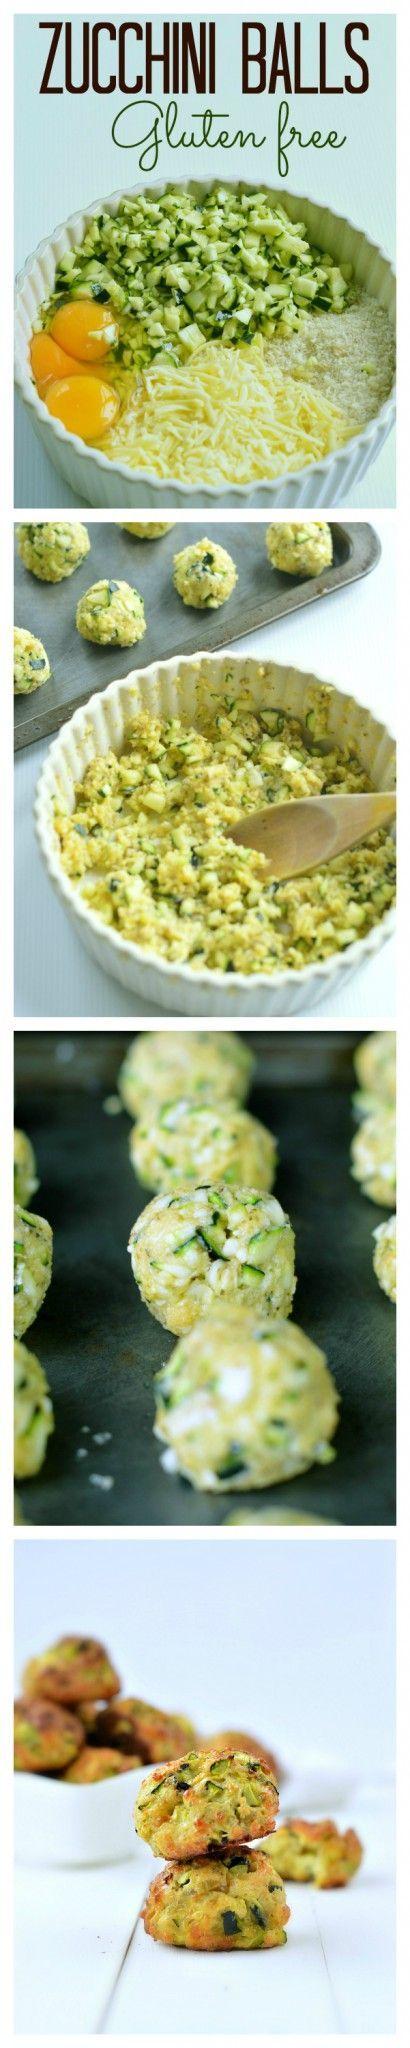 Zucchini balls| Zucchini recipes healthy clean eating appetizers | clean eating zucchini recipes